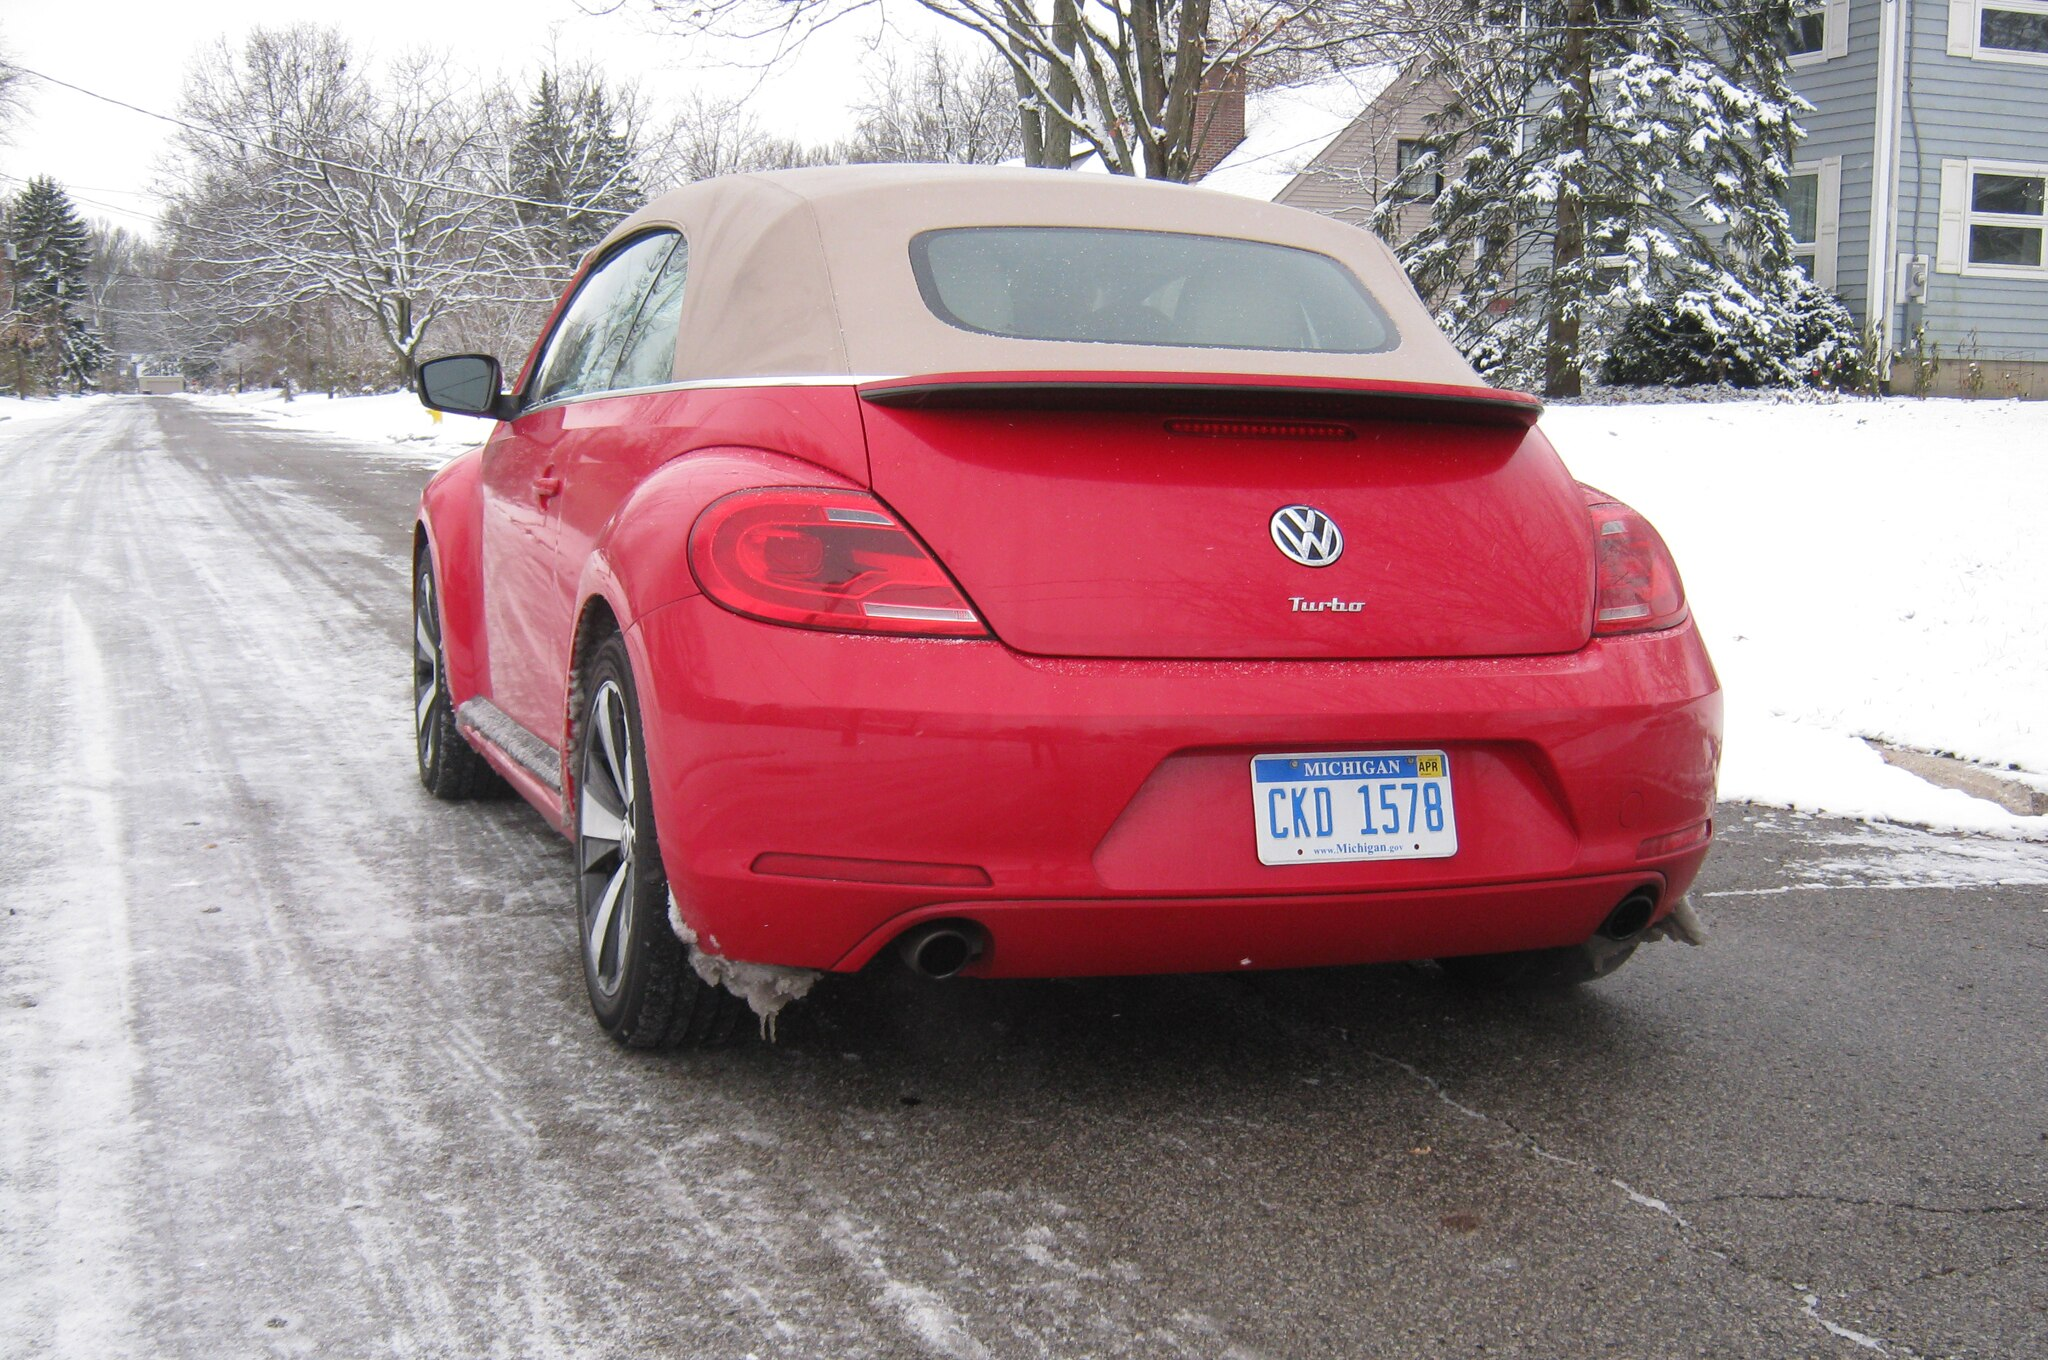 2013 Volkswagen Beetle Turbo Convertible Rear View Snow1